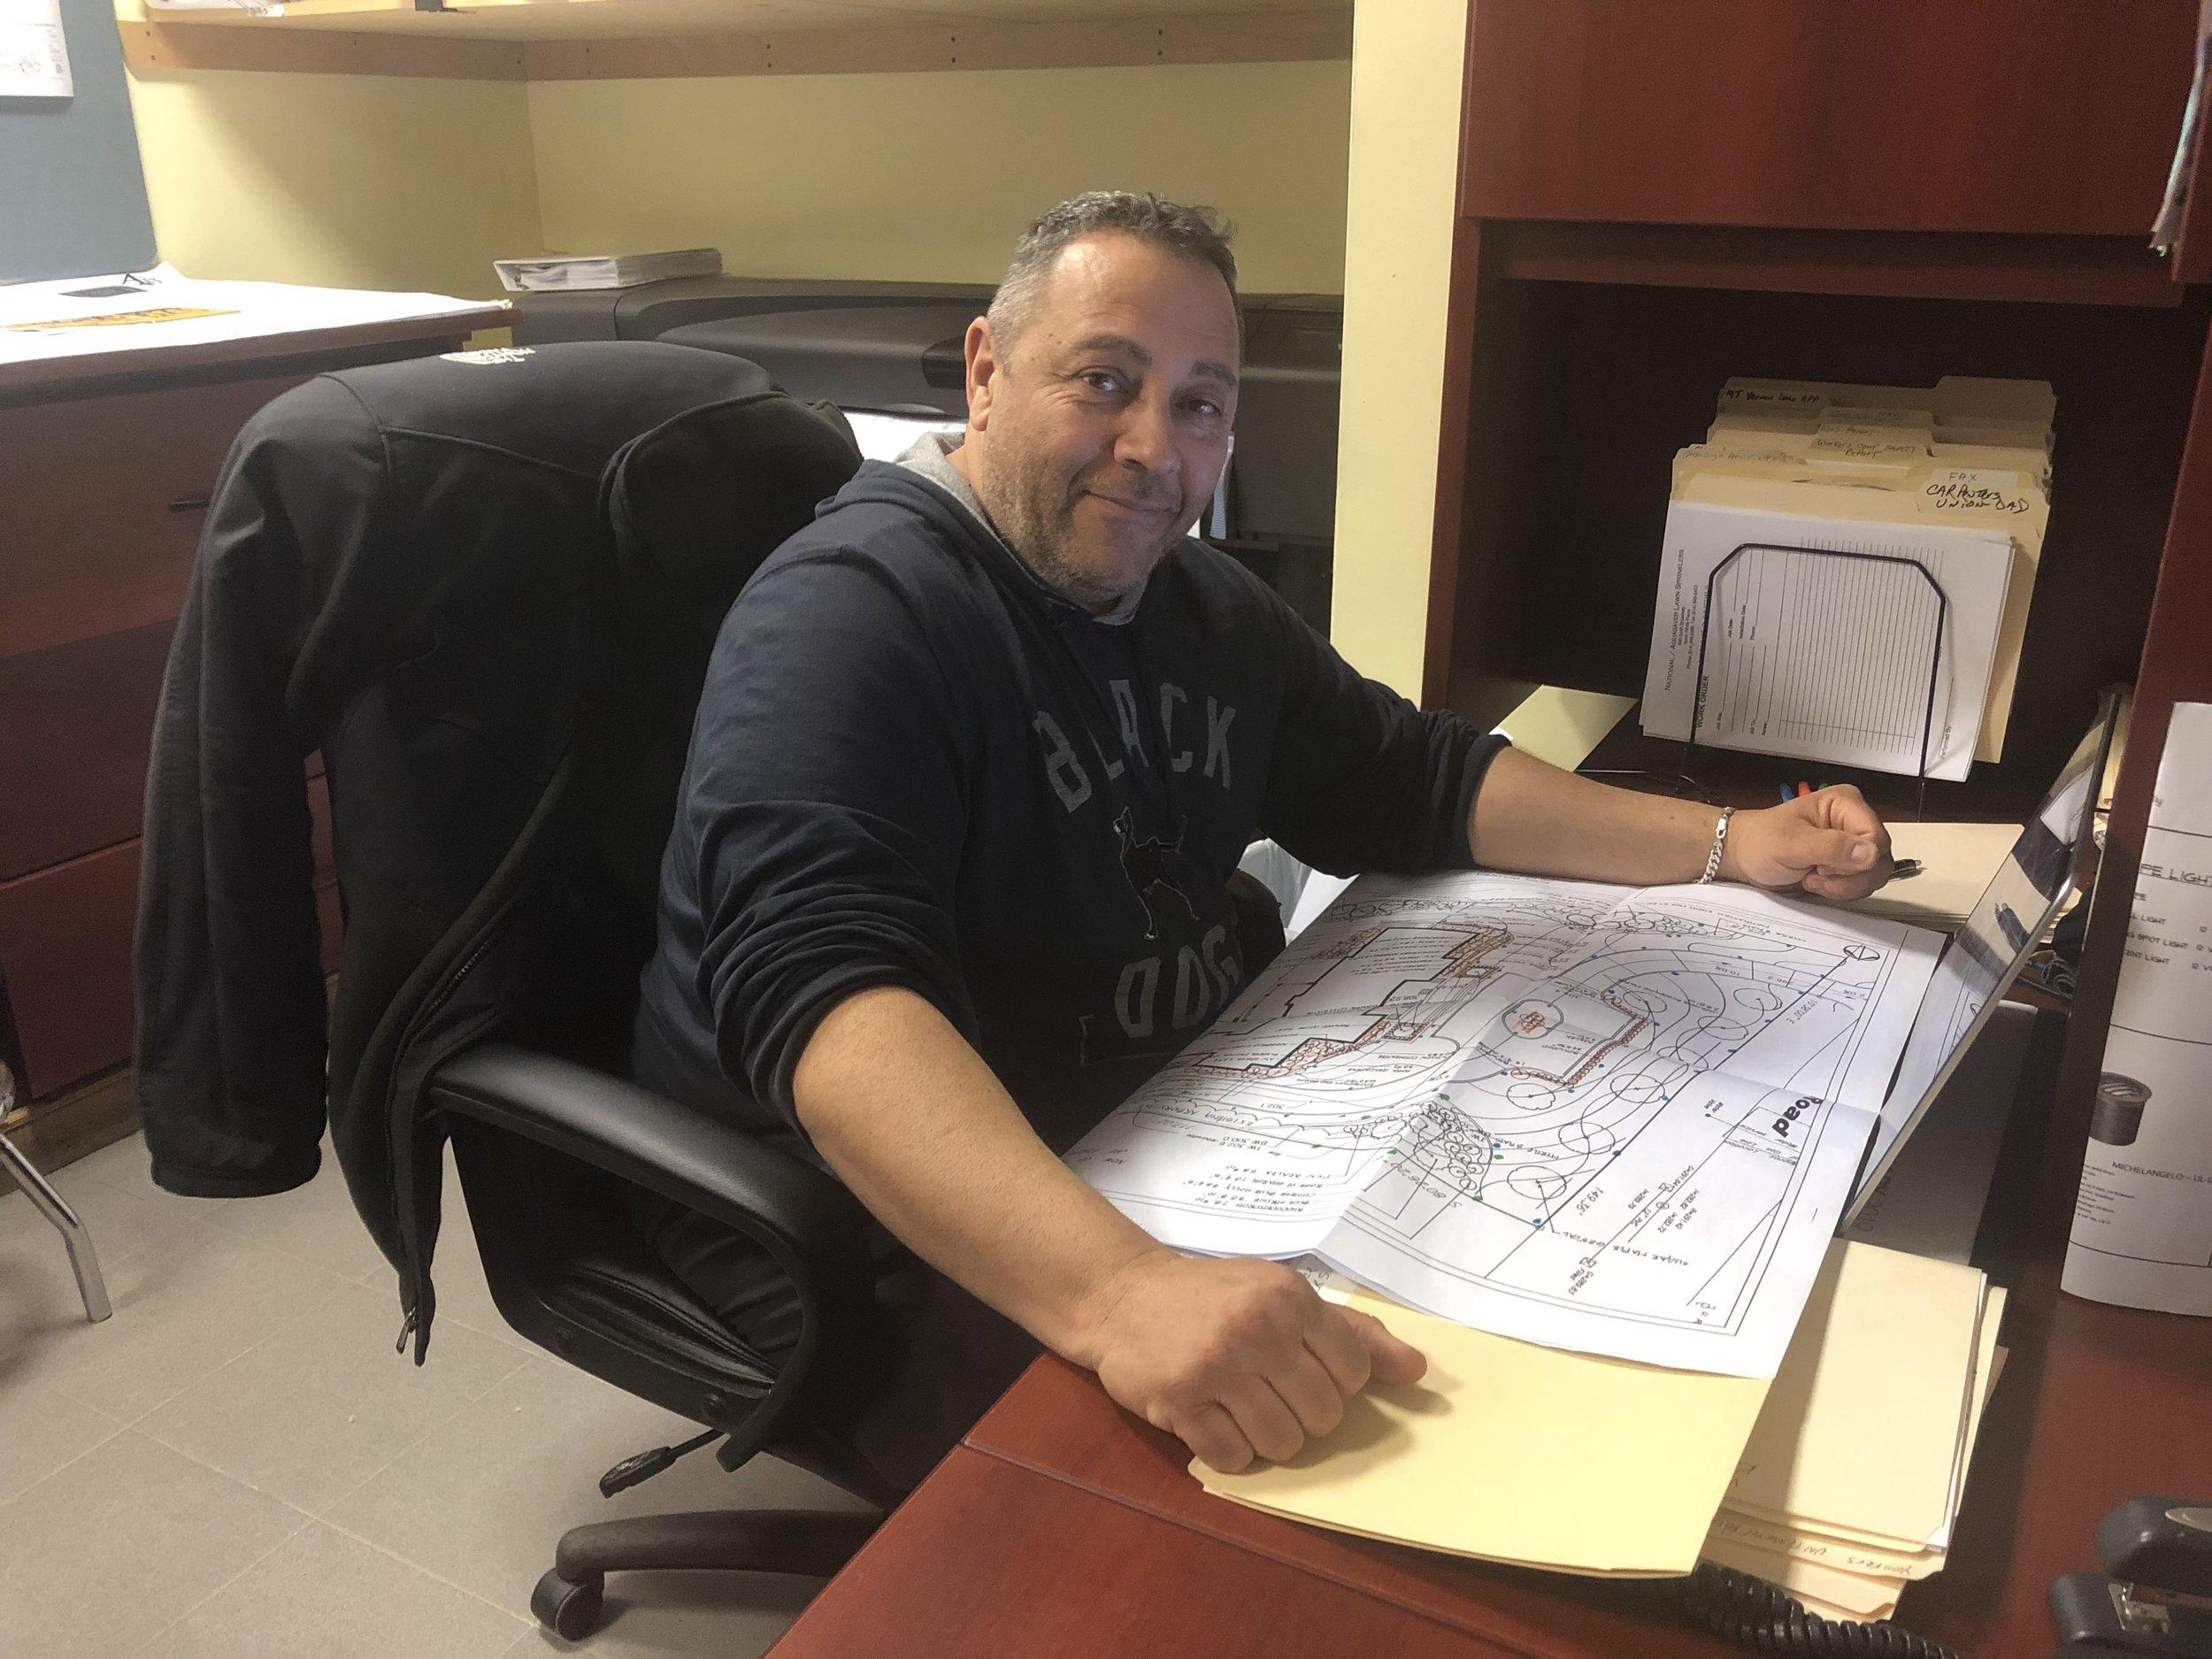 Artie Petroni - Assistant Vice President